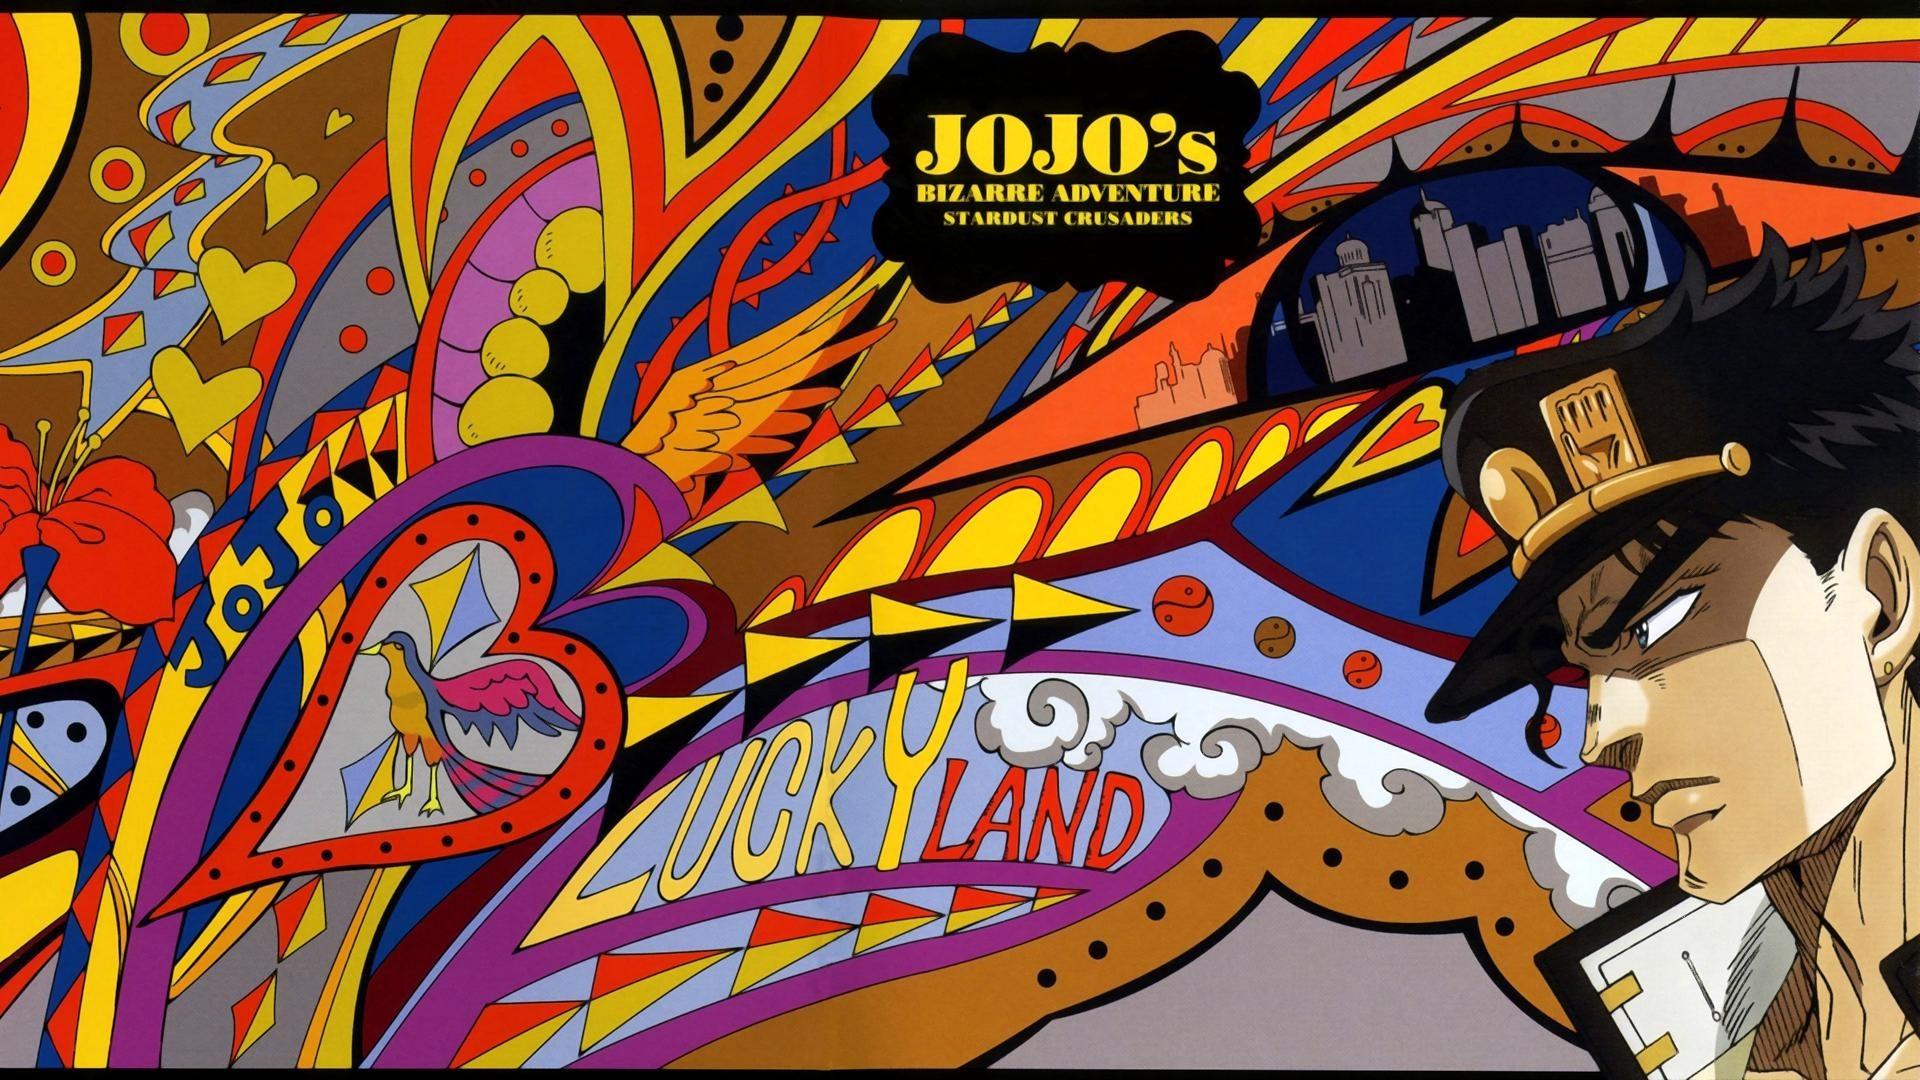 4k Jojo Wallpaper Posted By Sarah Anderson